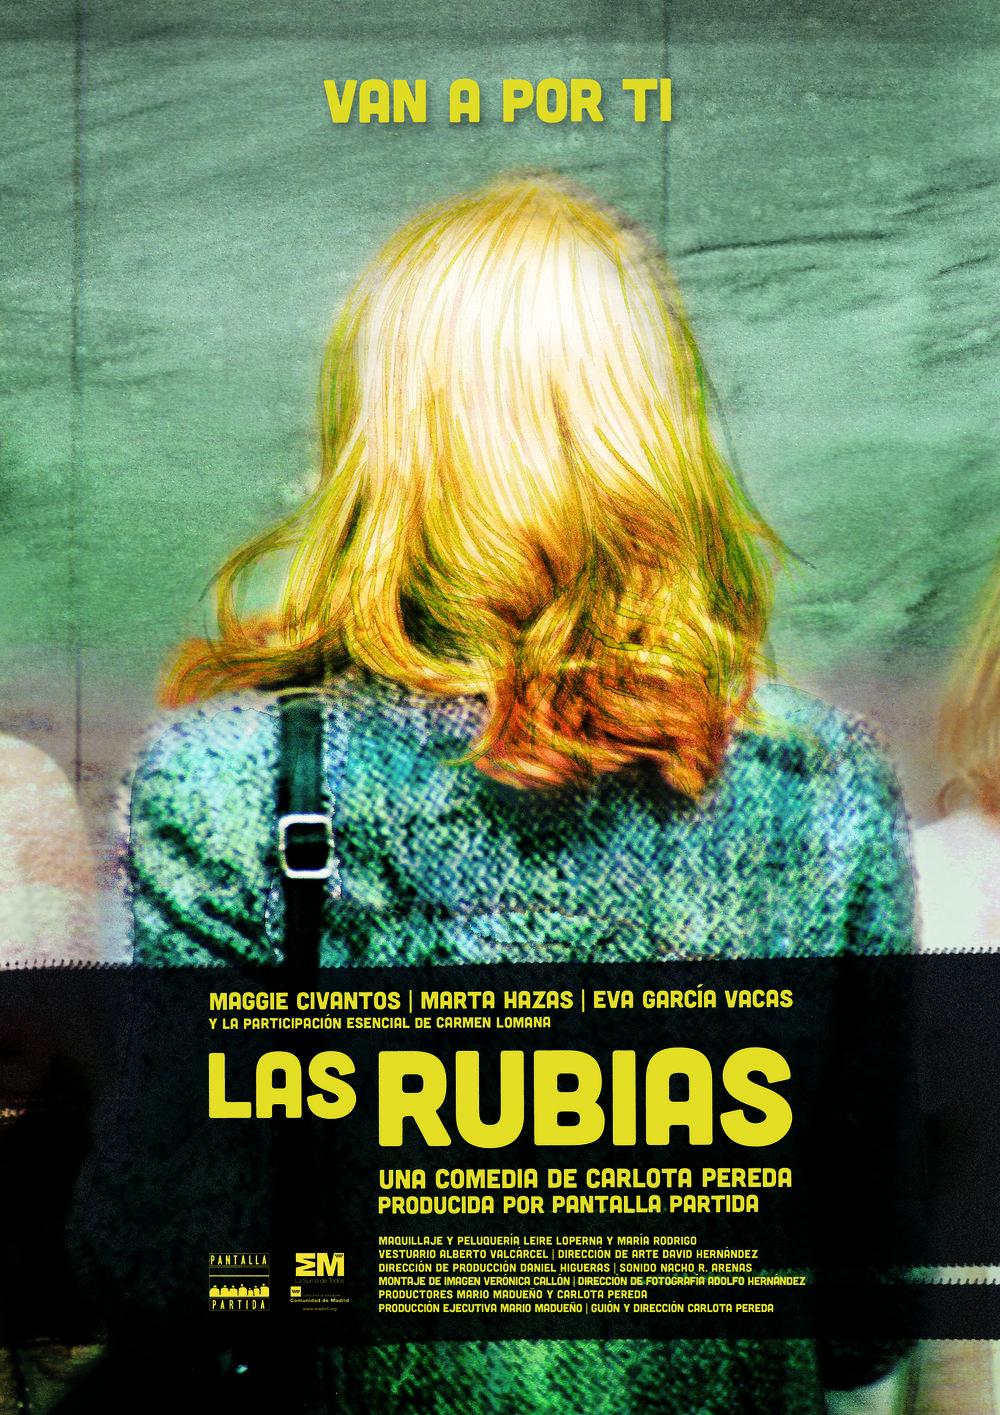 Las Rubias (The Blondes)